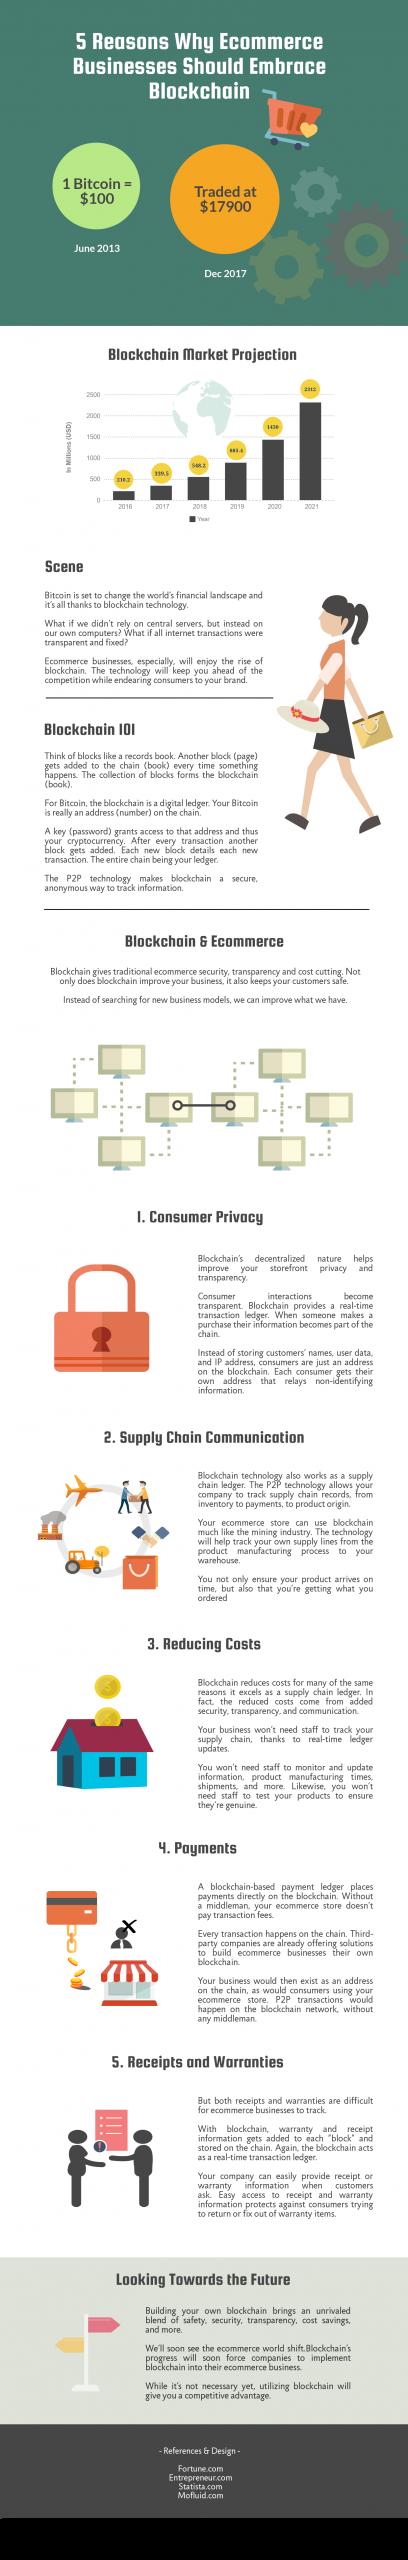 5 reasons ecommerce should embrace blockchain [infographic]